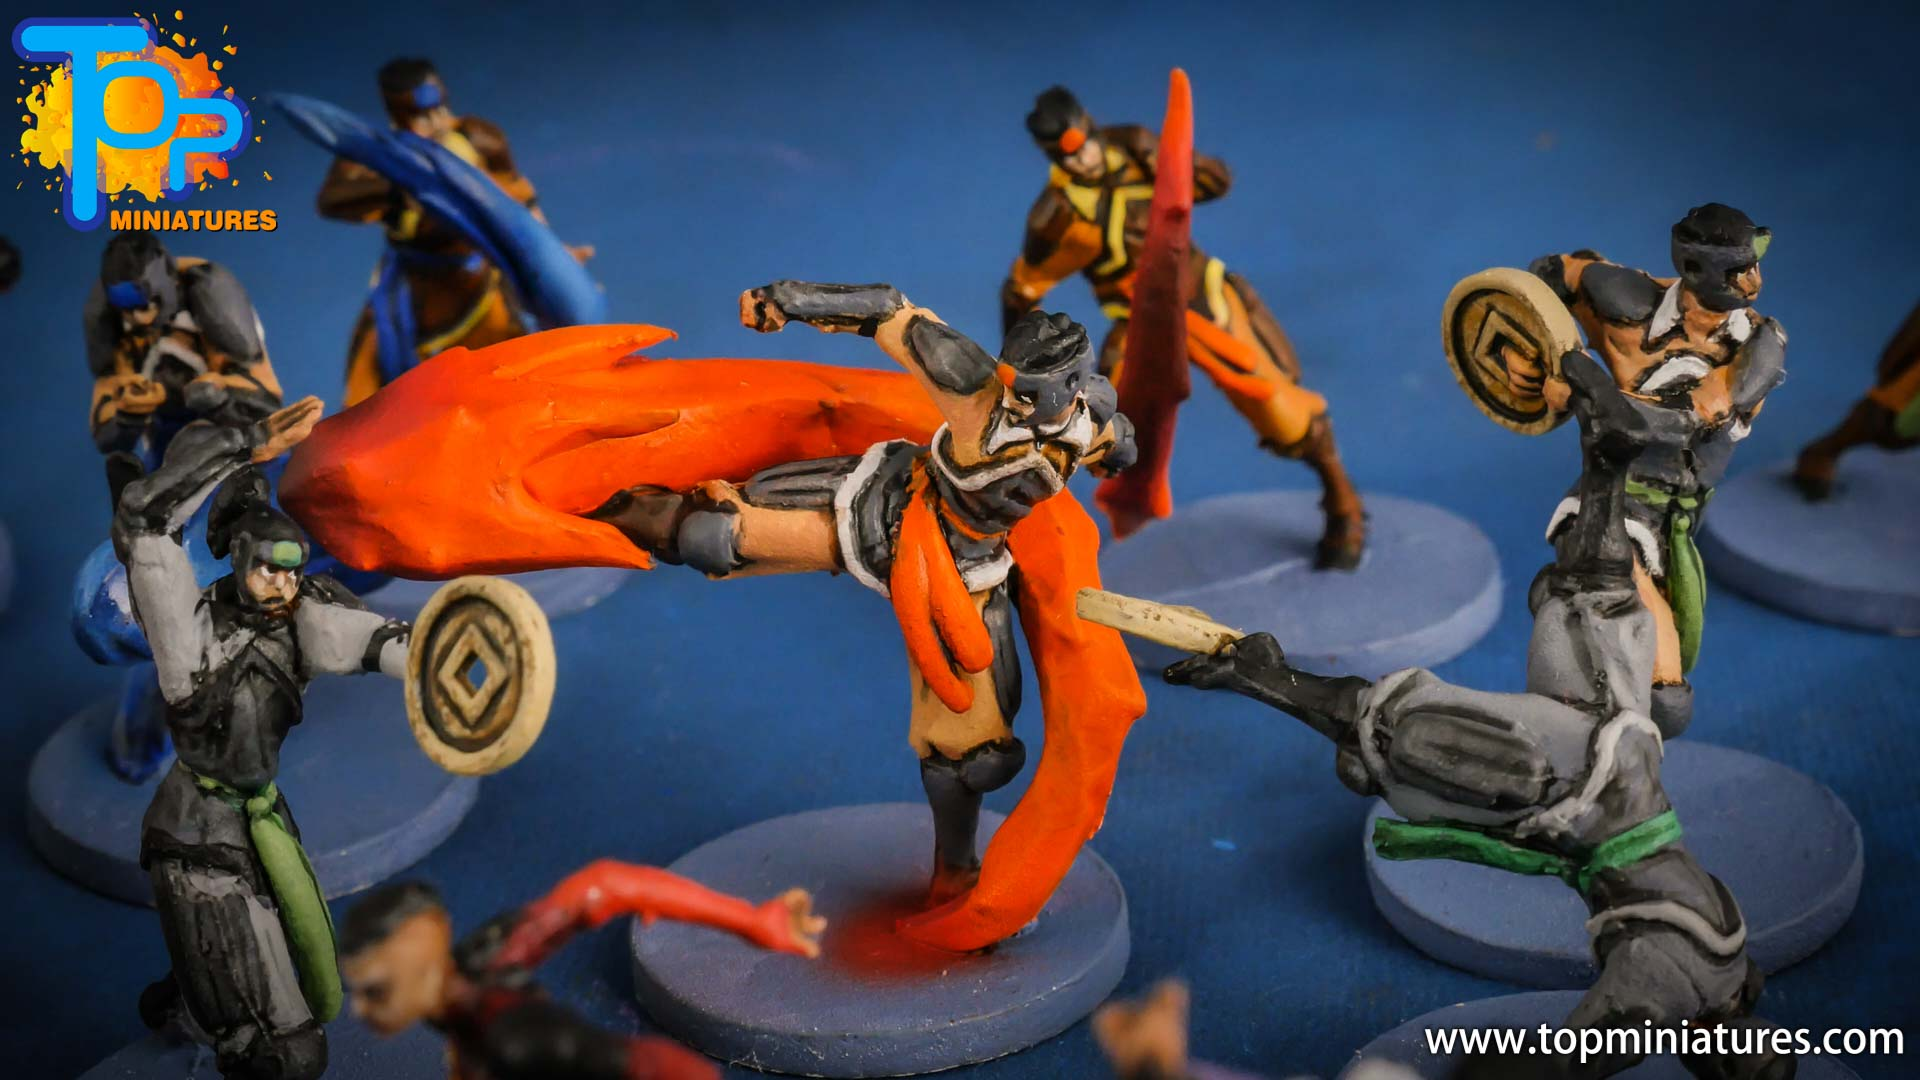 The Legend of Korra Pro-bending arena (9)